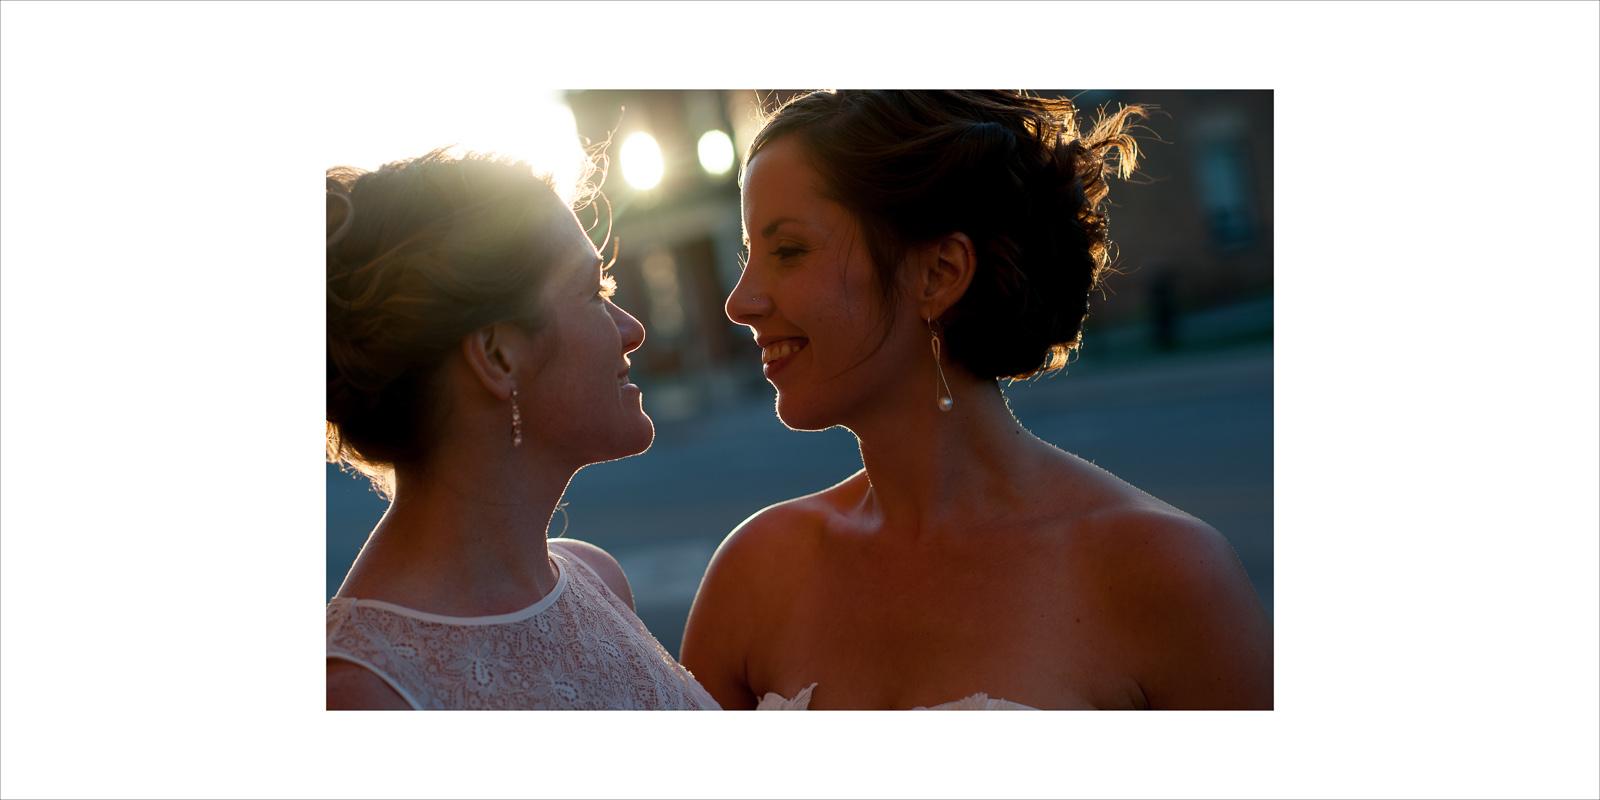 collingwood-wedding-photo-album-022.jpg